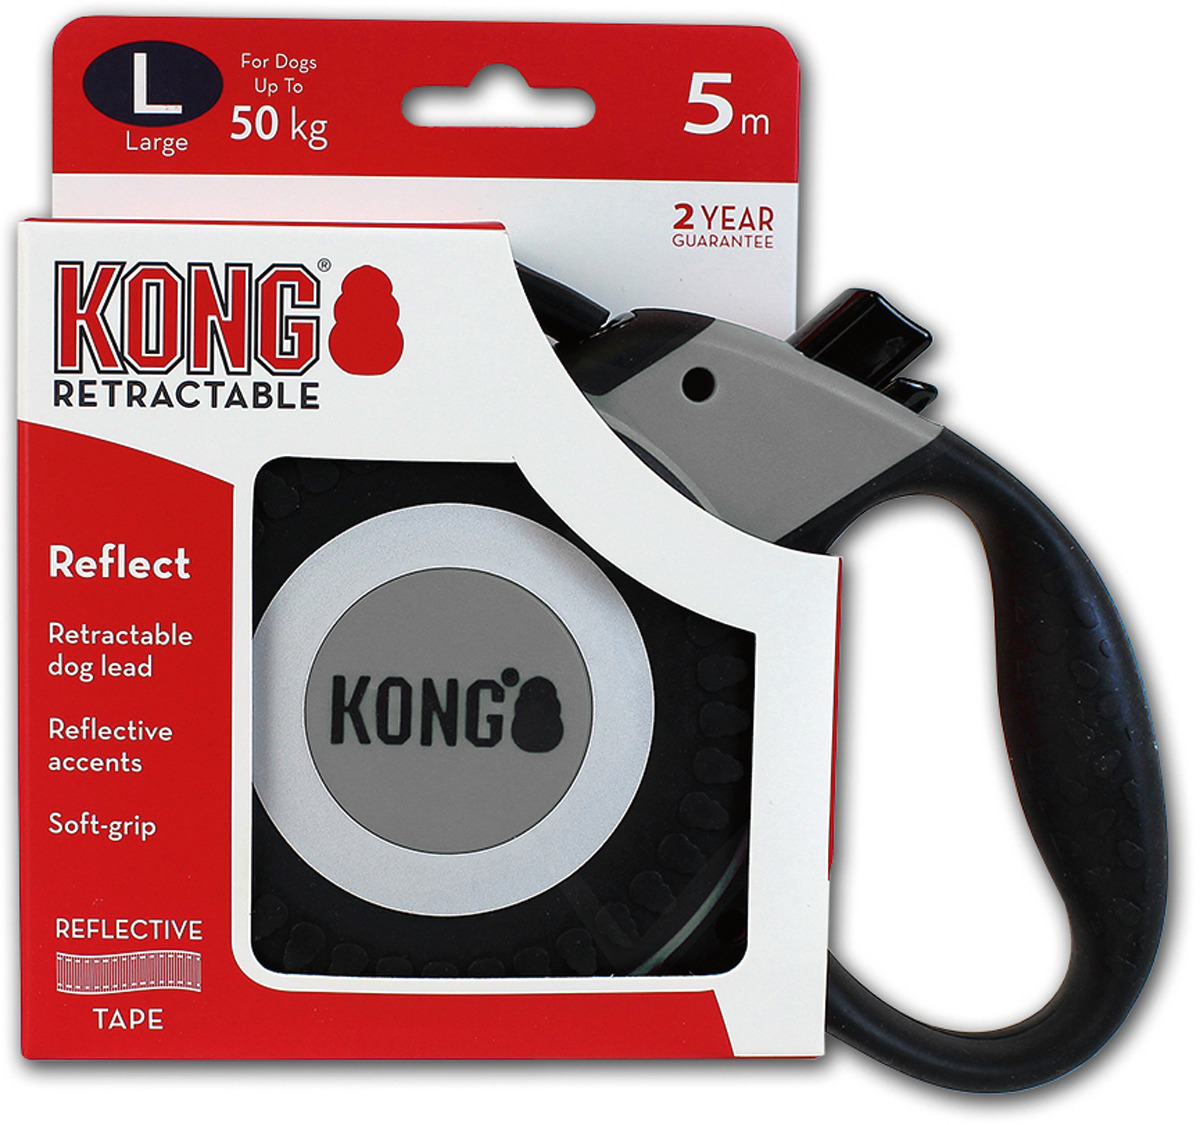 Поводок-рулетка для собак Kong Reflect L, цвет: серый, до 50 кг, 5 м